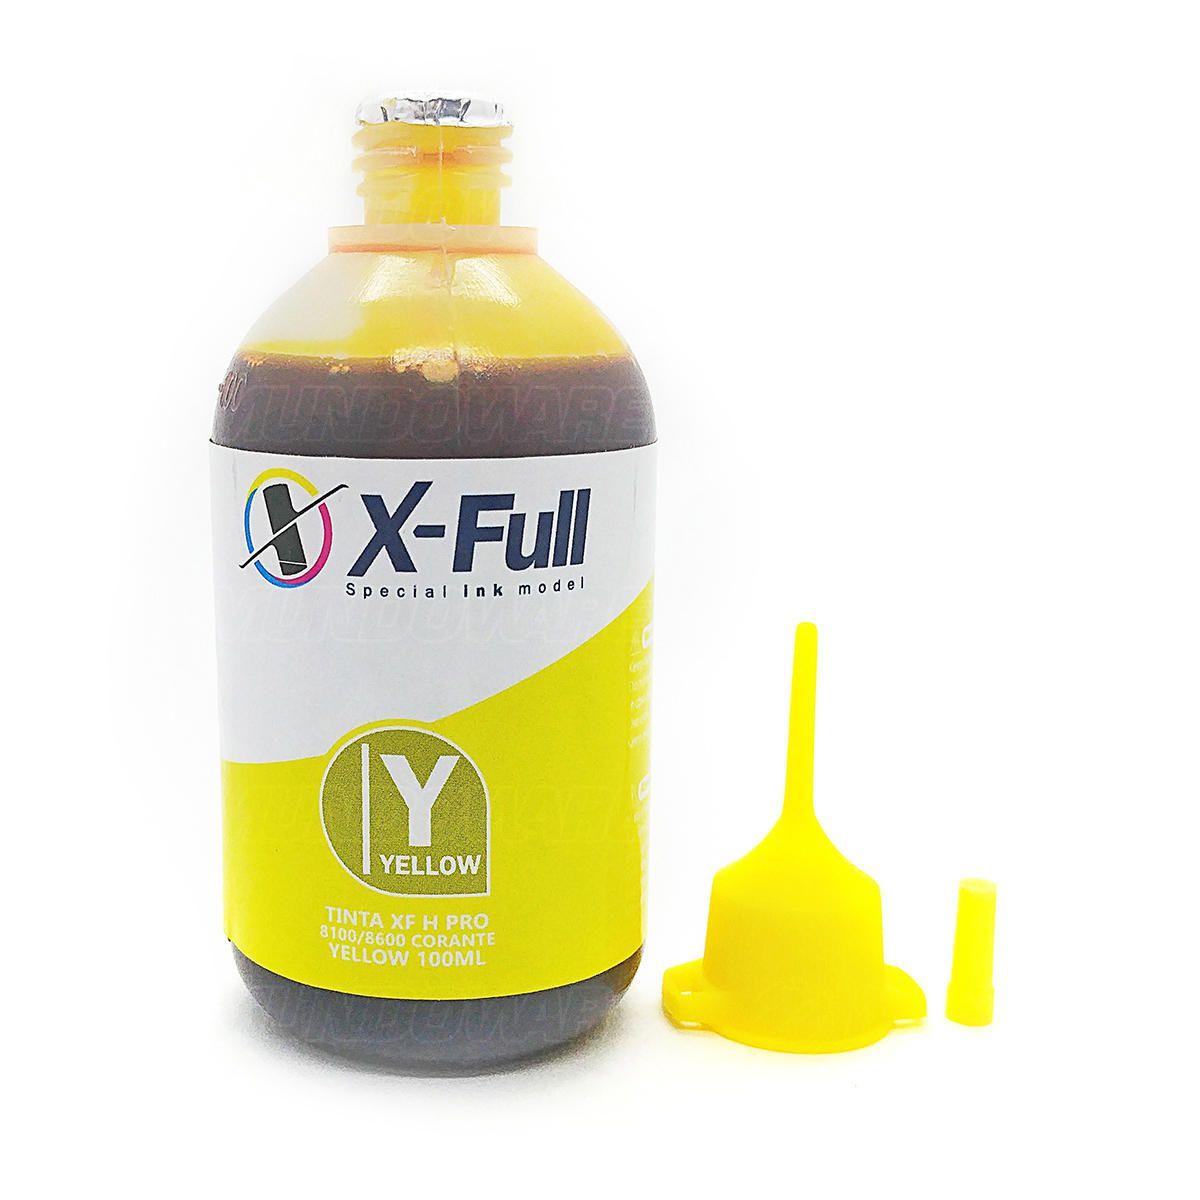 Compatível: Tinta Corante X-Full para HP 8600 8500 8100 8000 8600w X576dw X551dw X476dw X451dw / Amarelo / 100ml